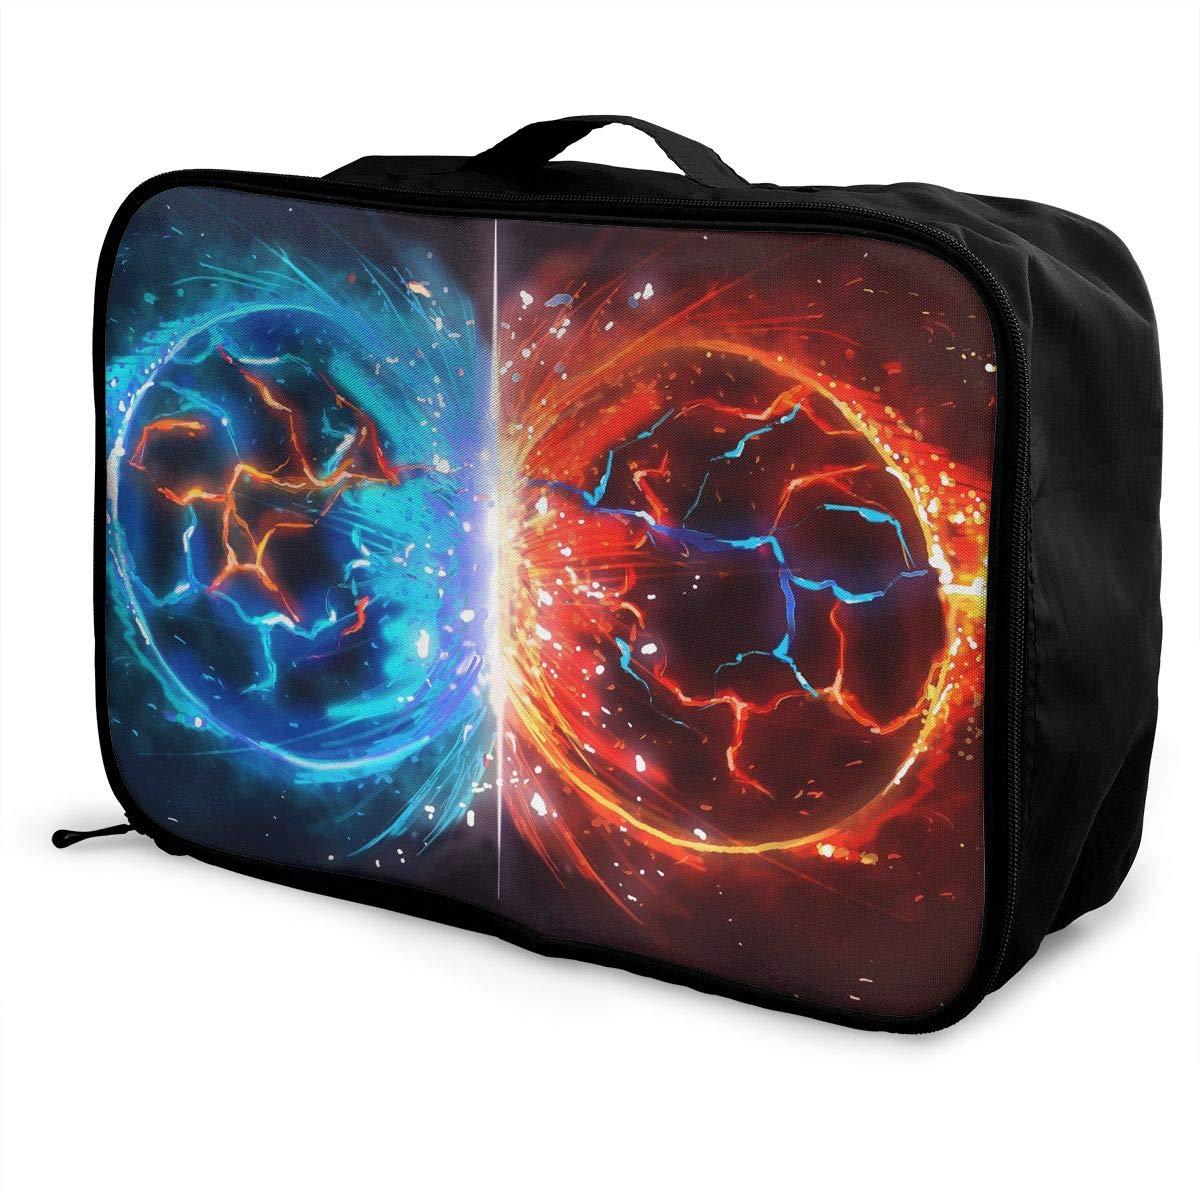 Travel Luggage Duffle Bag Lightweight Portable Handbag Water Fire Print Large Capacity Waterproof Foldable Storage Tote